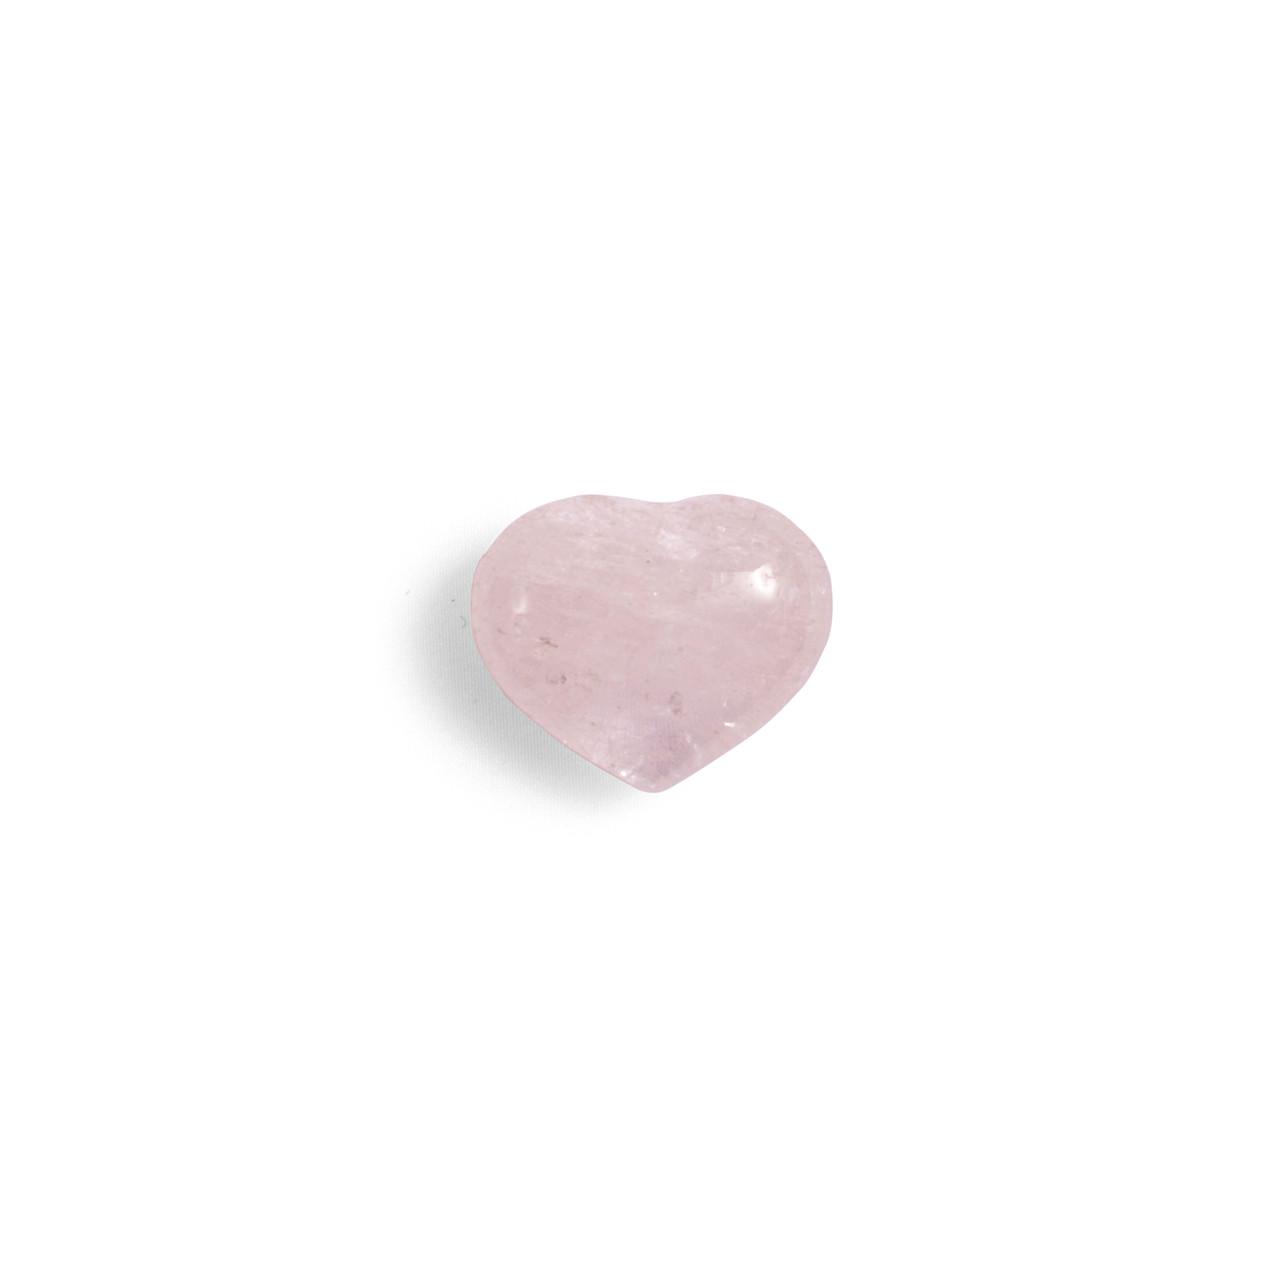 Clear Quartz Mini Heart Shaped Stone